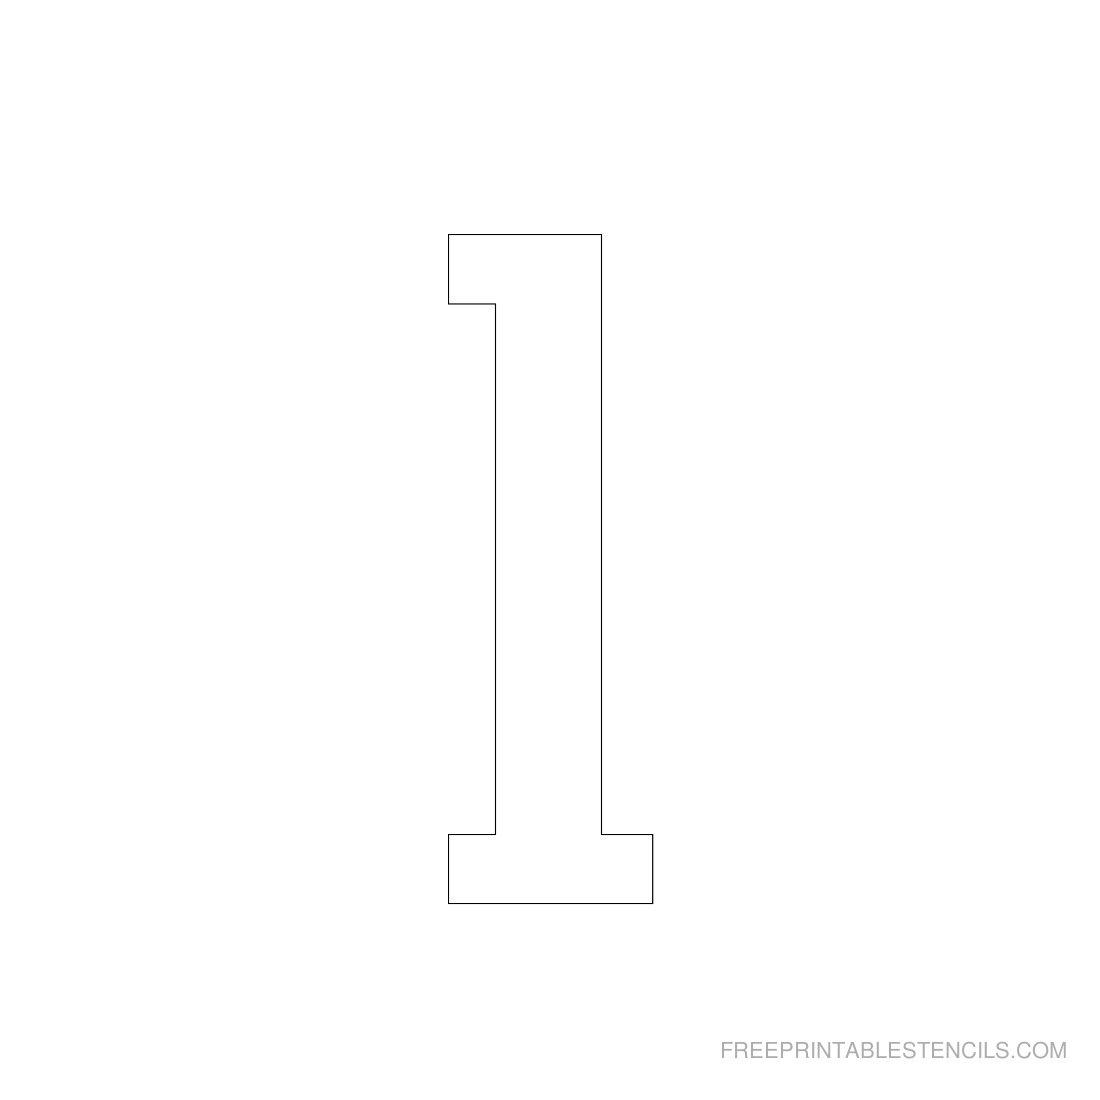 Printable 3 Inch Number Stencils 1-10 | Free Printable Stencils - Free Printable 4 Inch Number Stencils